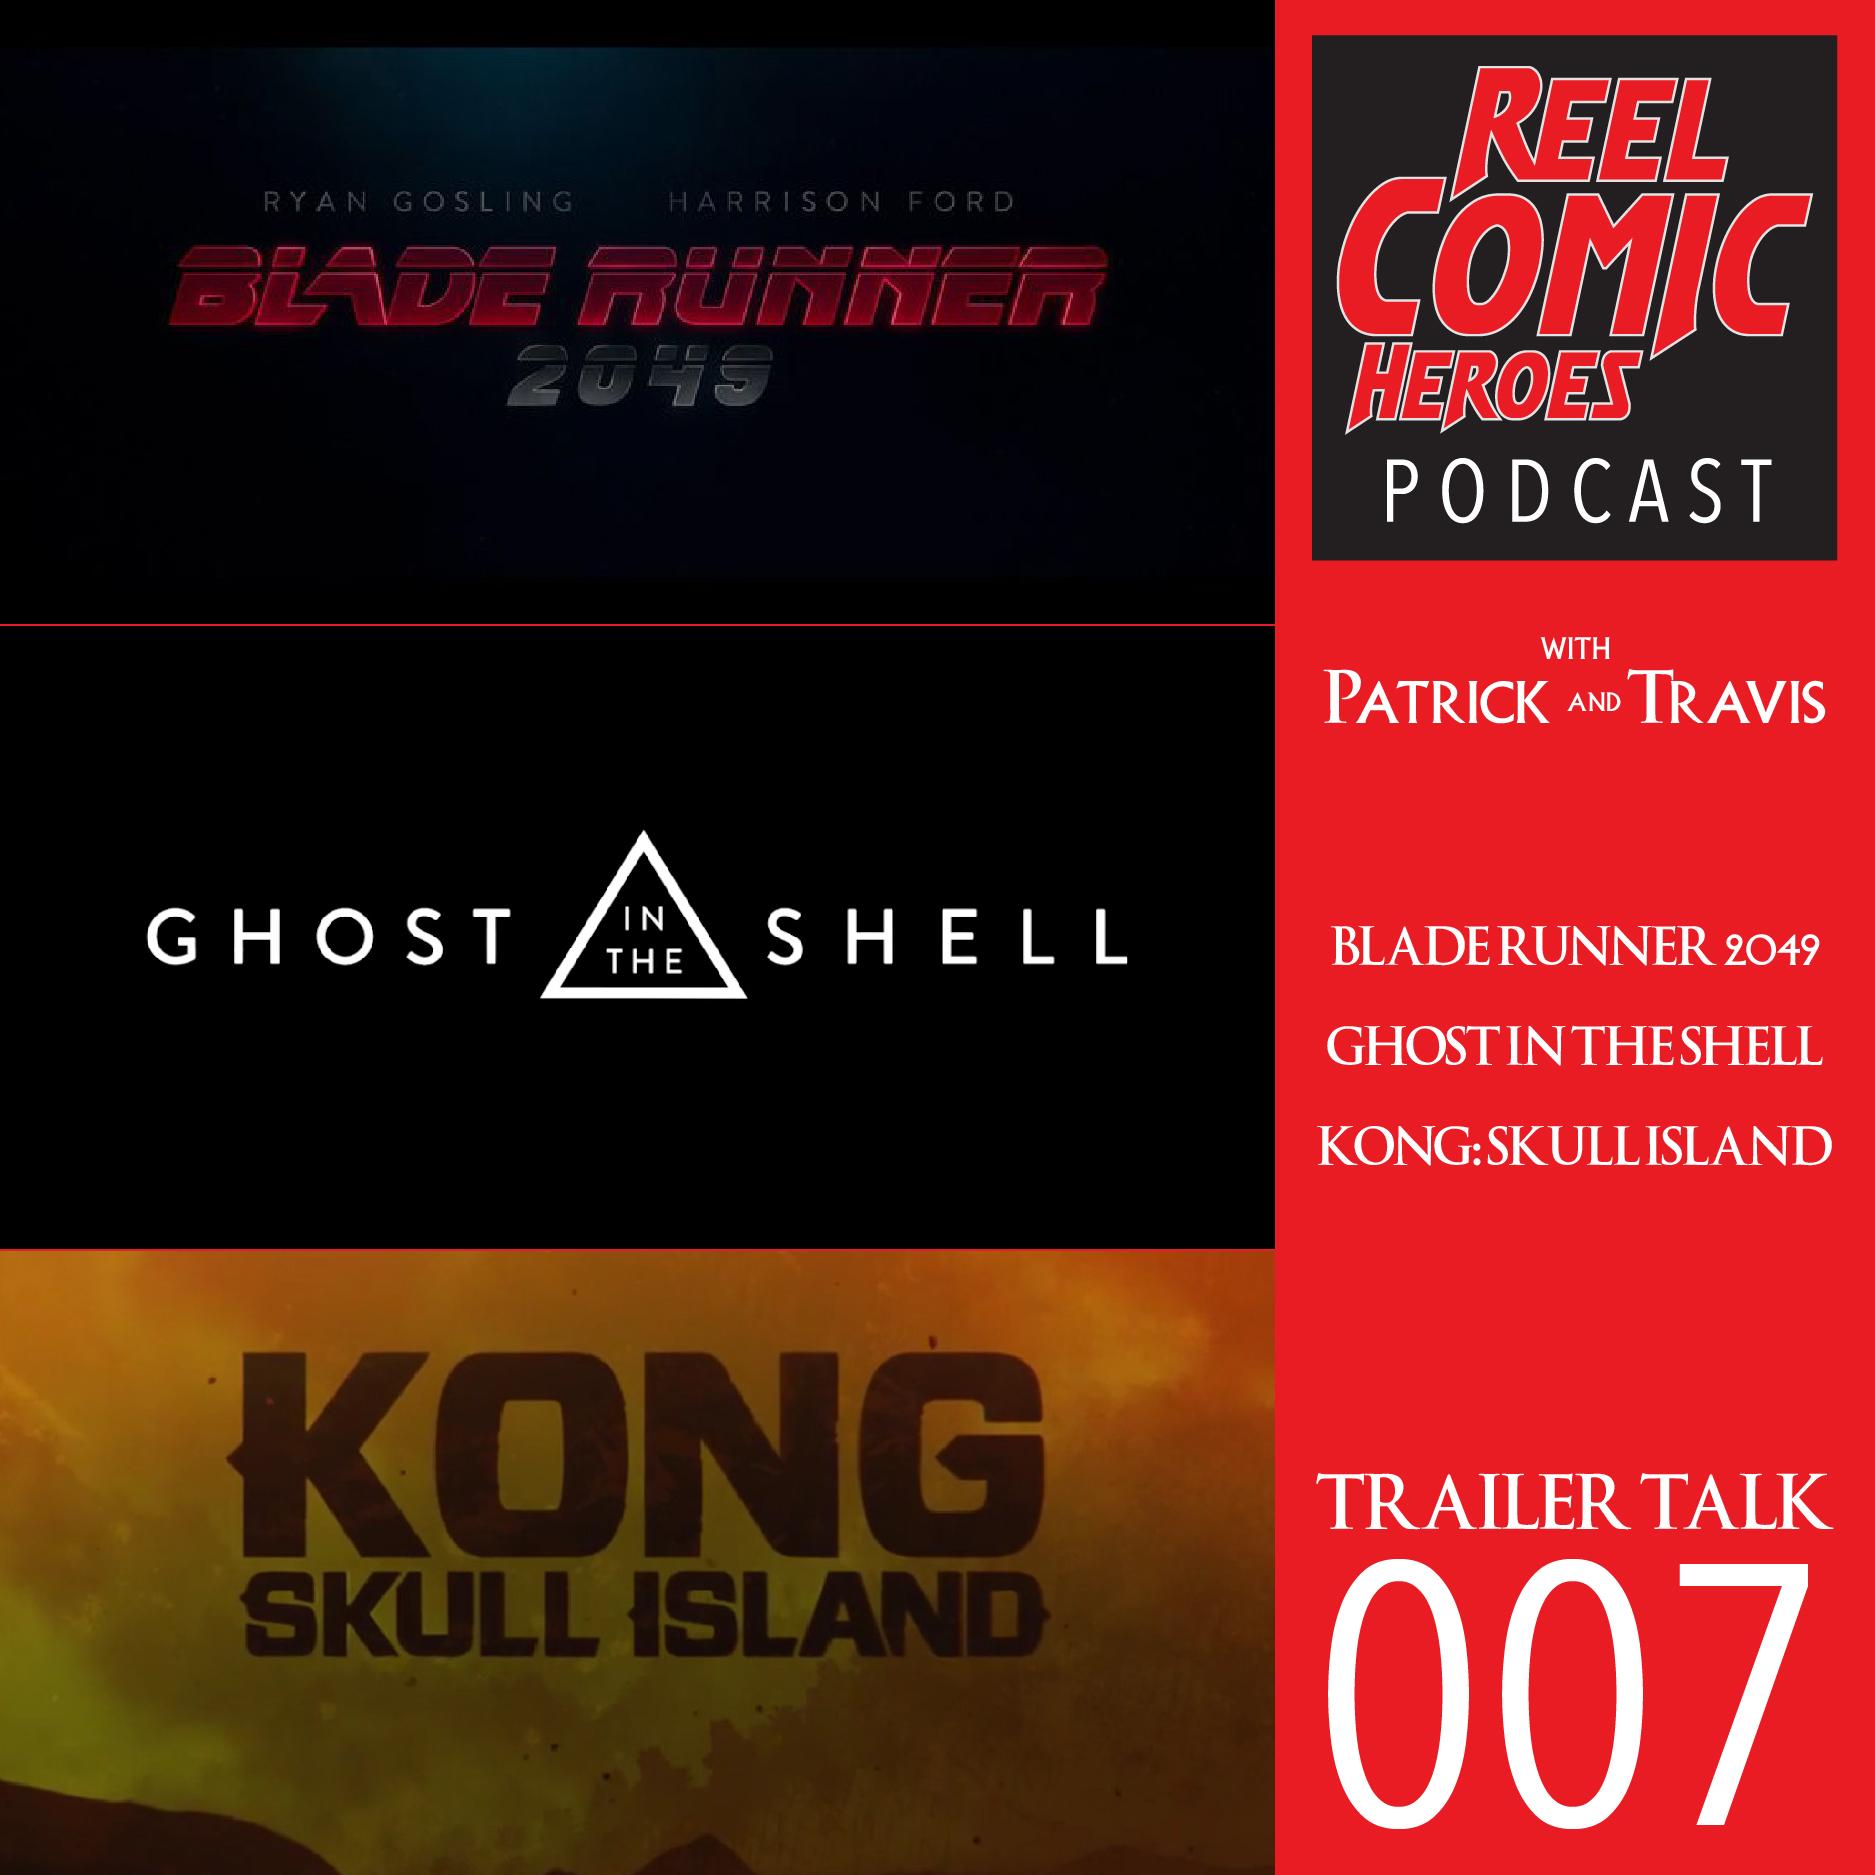 Artwork for Reel Comic Heroes - Trailer Talk 007